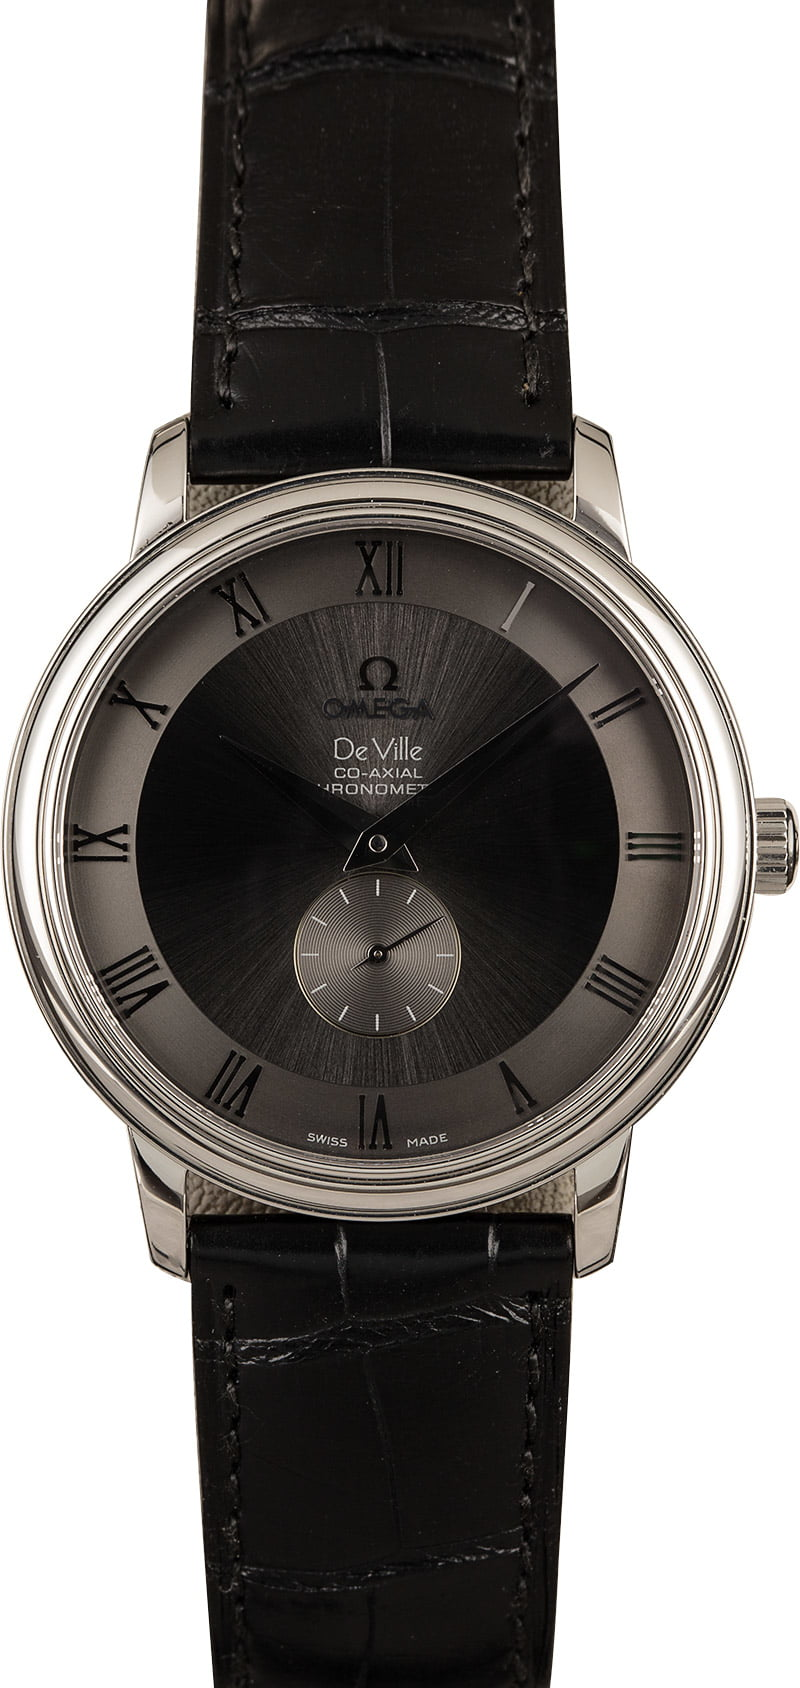 Omega Watches DeVille Prestige Dress watch Small SecondsCo-Axial Chronometer